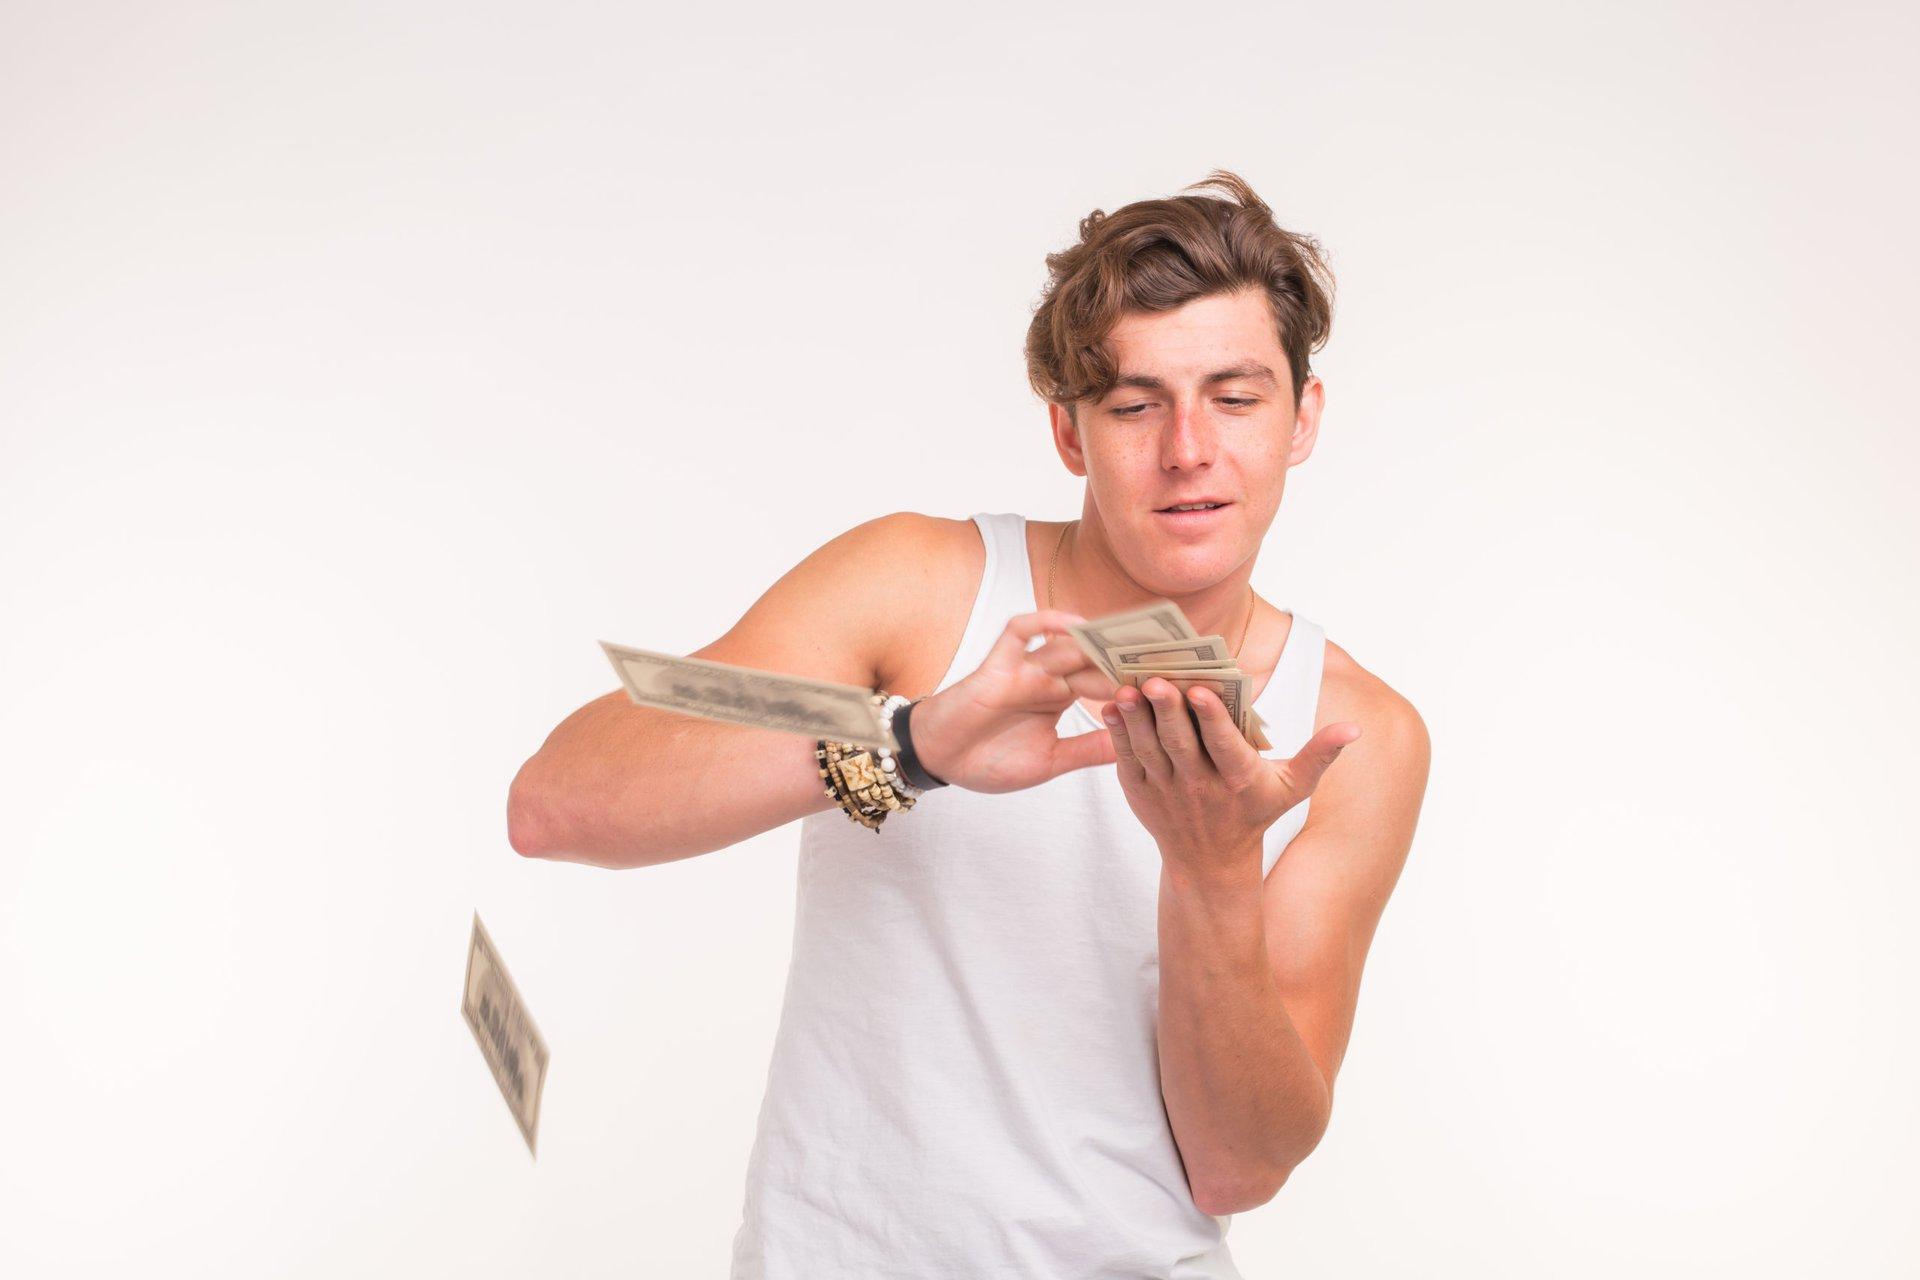 Rich man wasting money